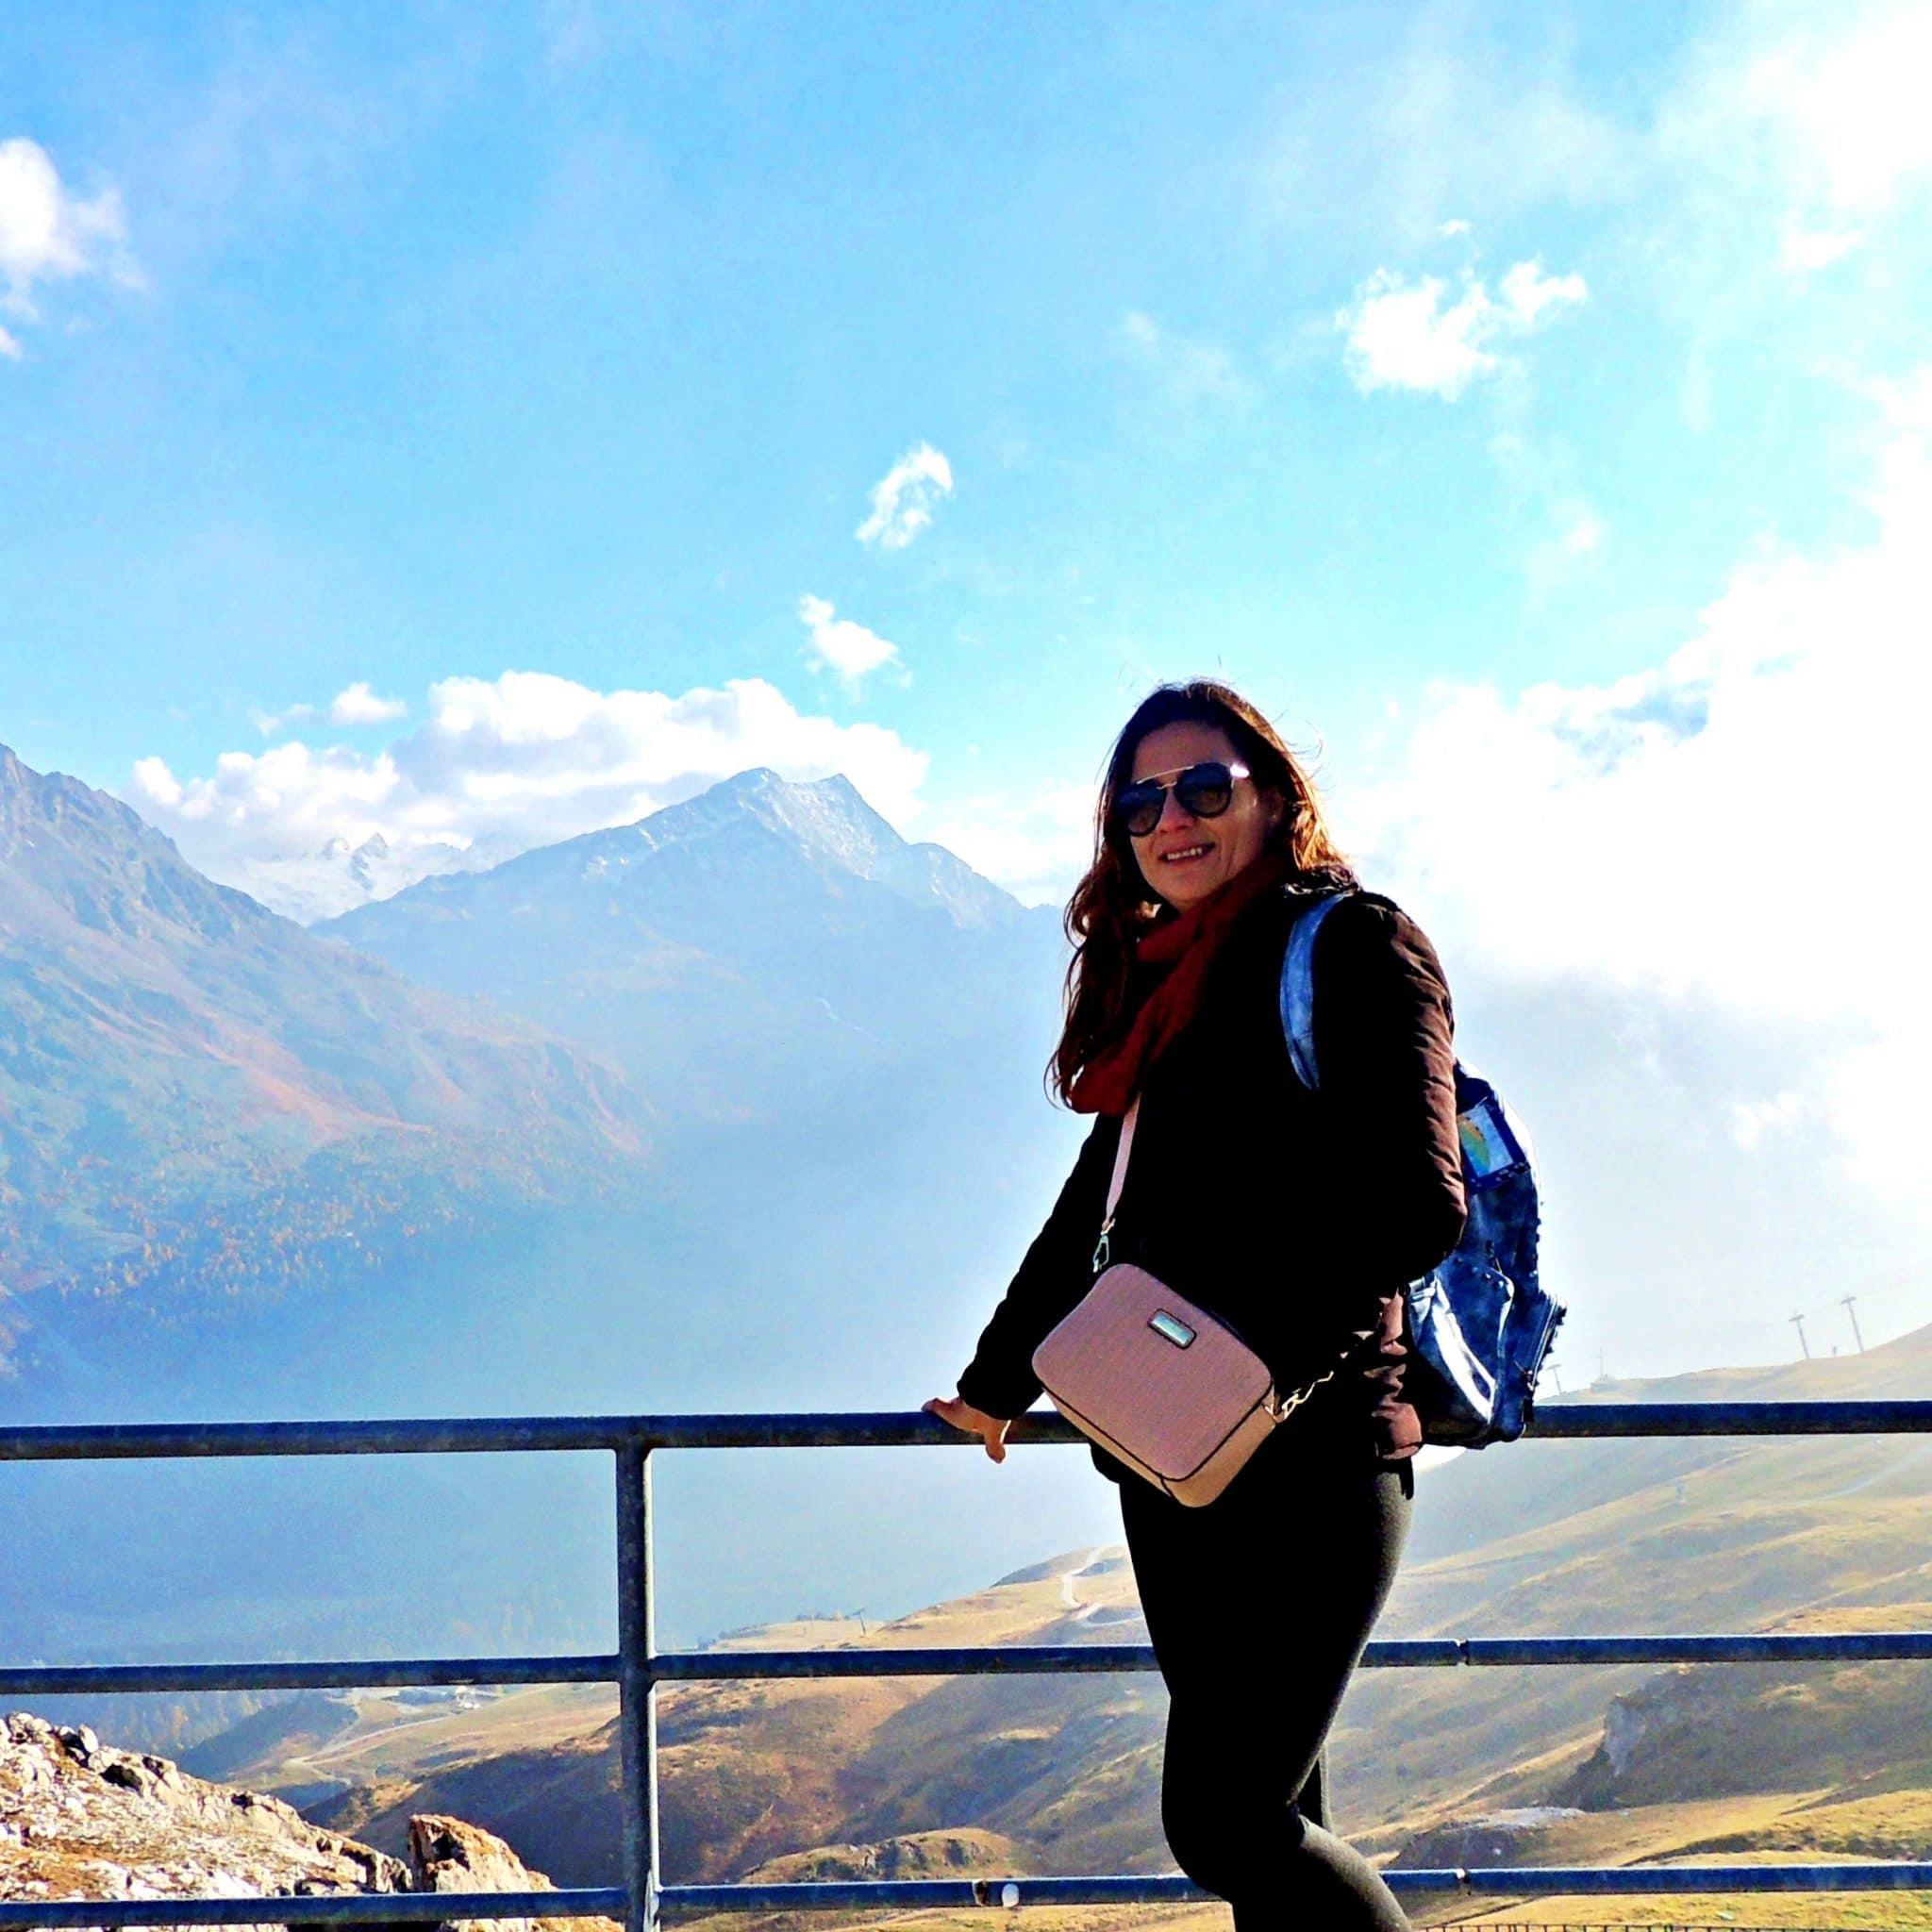 Vista de Corviglia - St Moritz